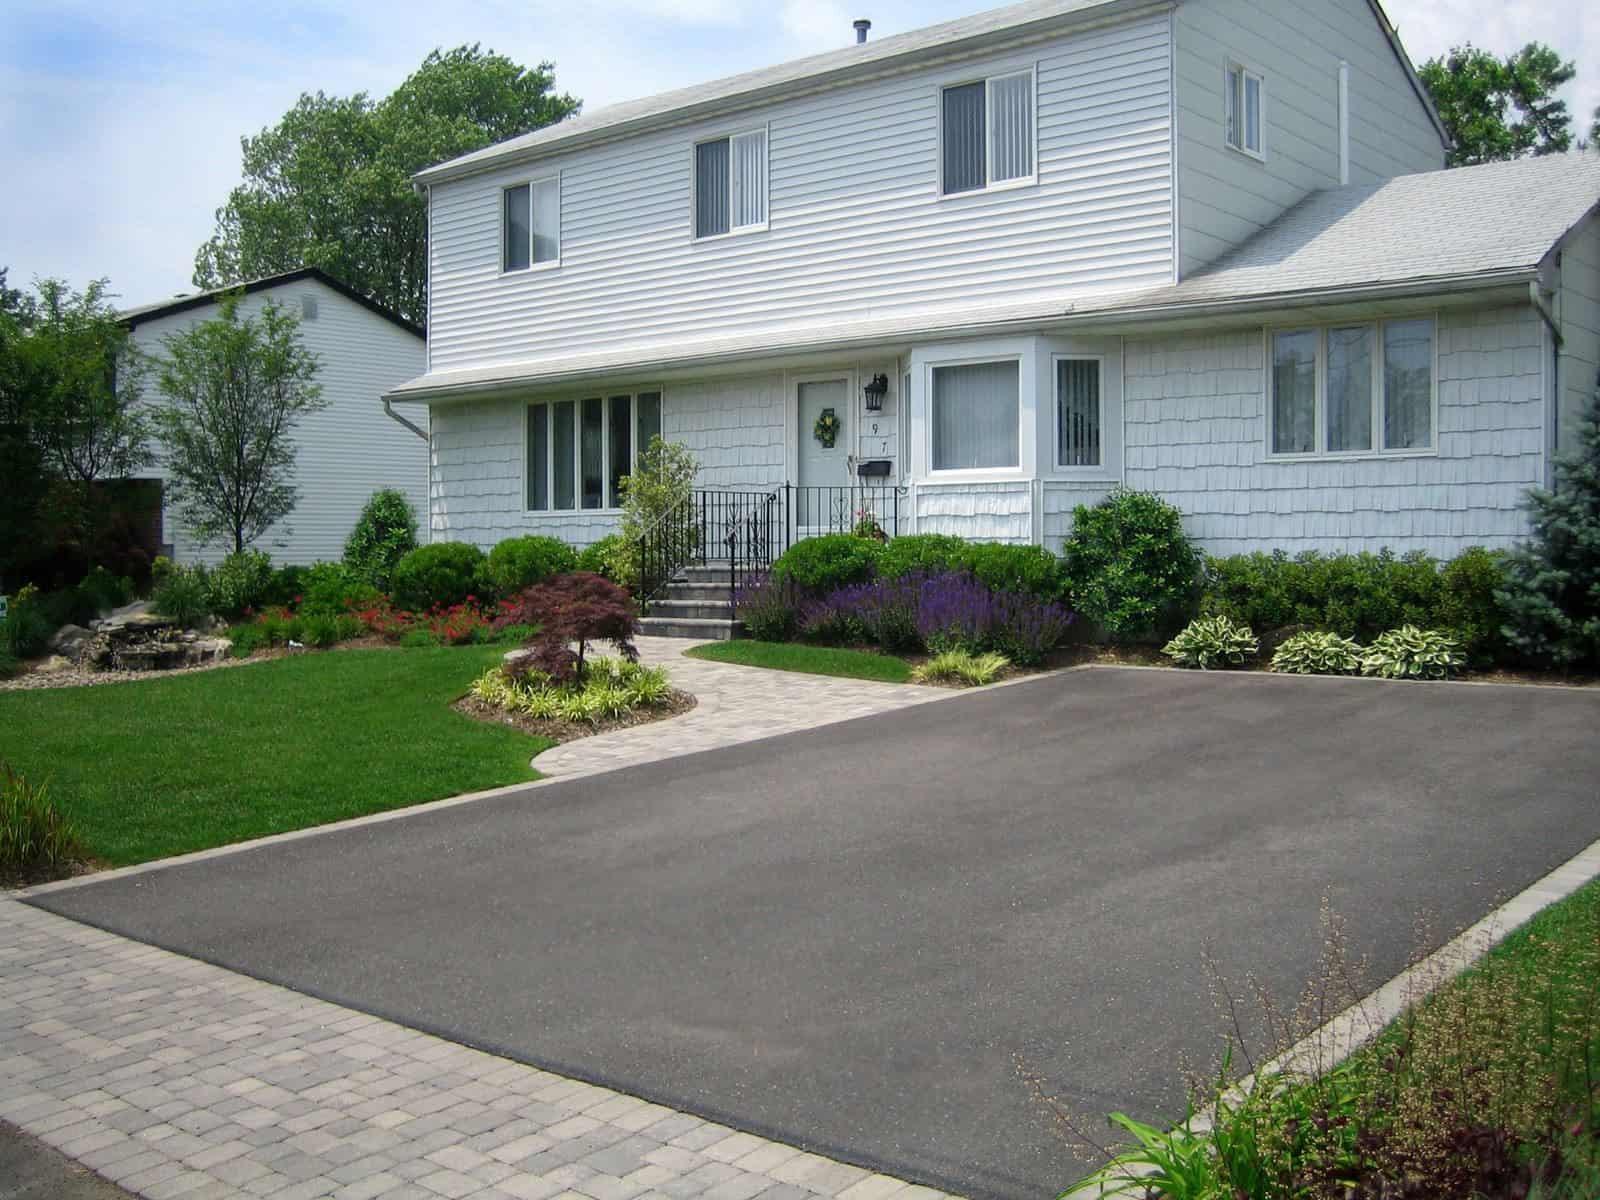 Asphalt Driveway - Nicolock Roma I & Roma II Paver Apron, Walkway, and Stoop - Color - Granite City - Dix Hills, Long Island NY